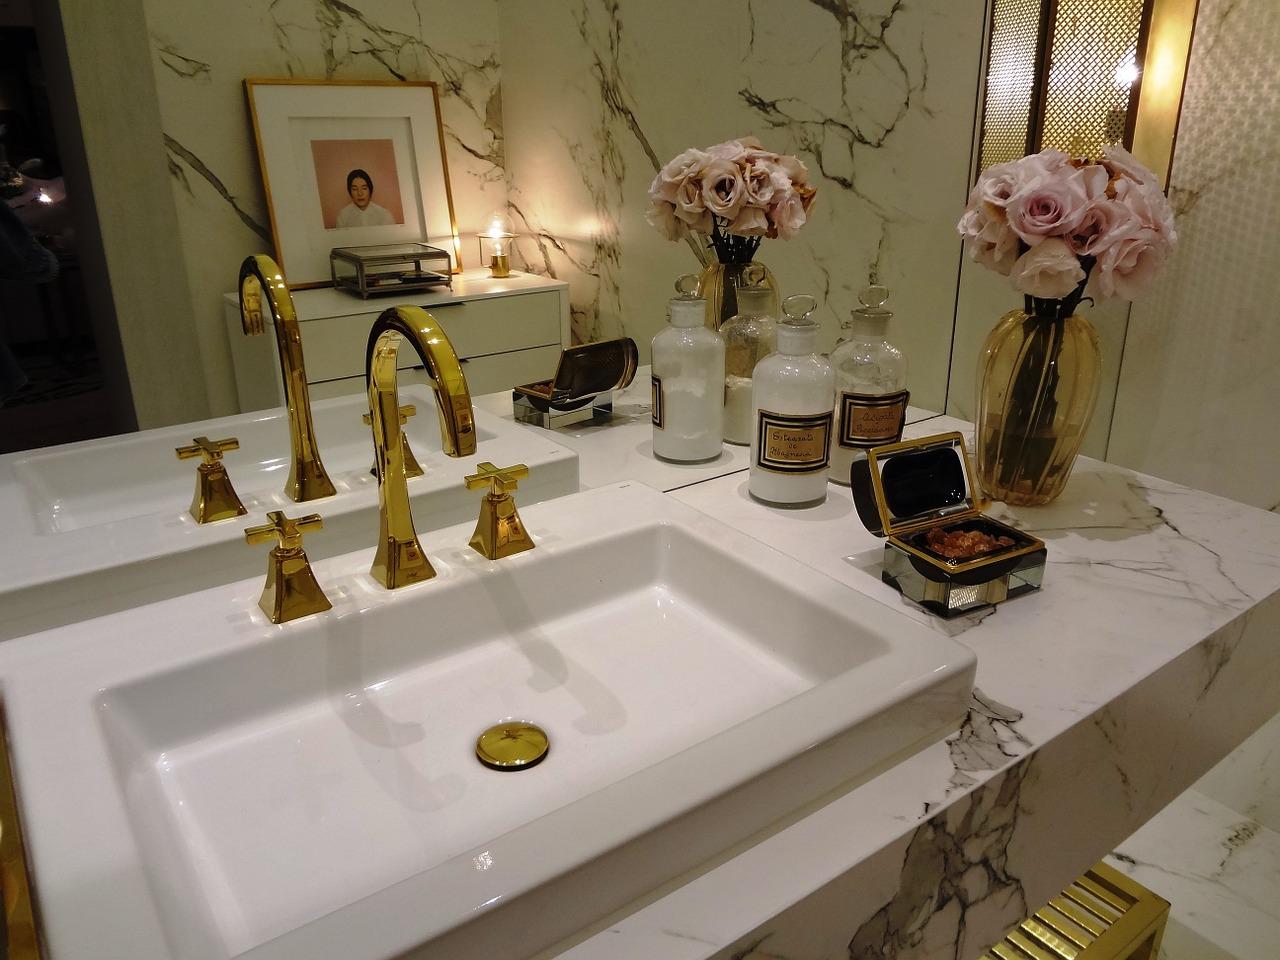 Salle de bains : pour quelle vasque opter ?